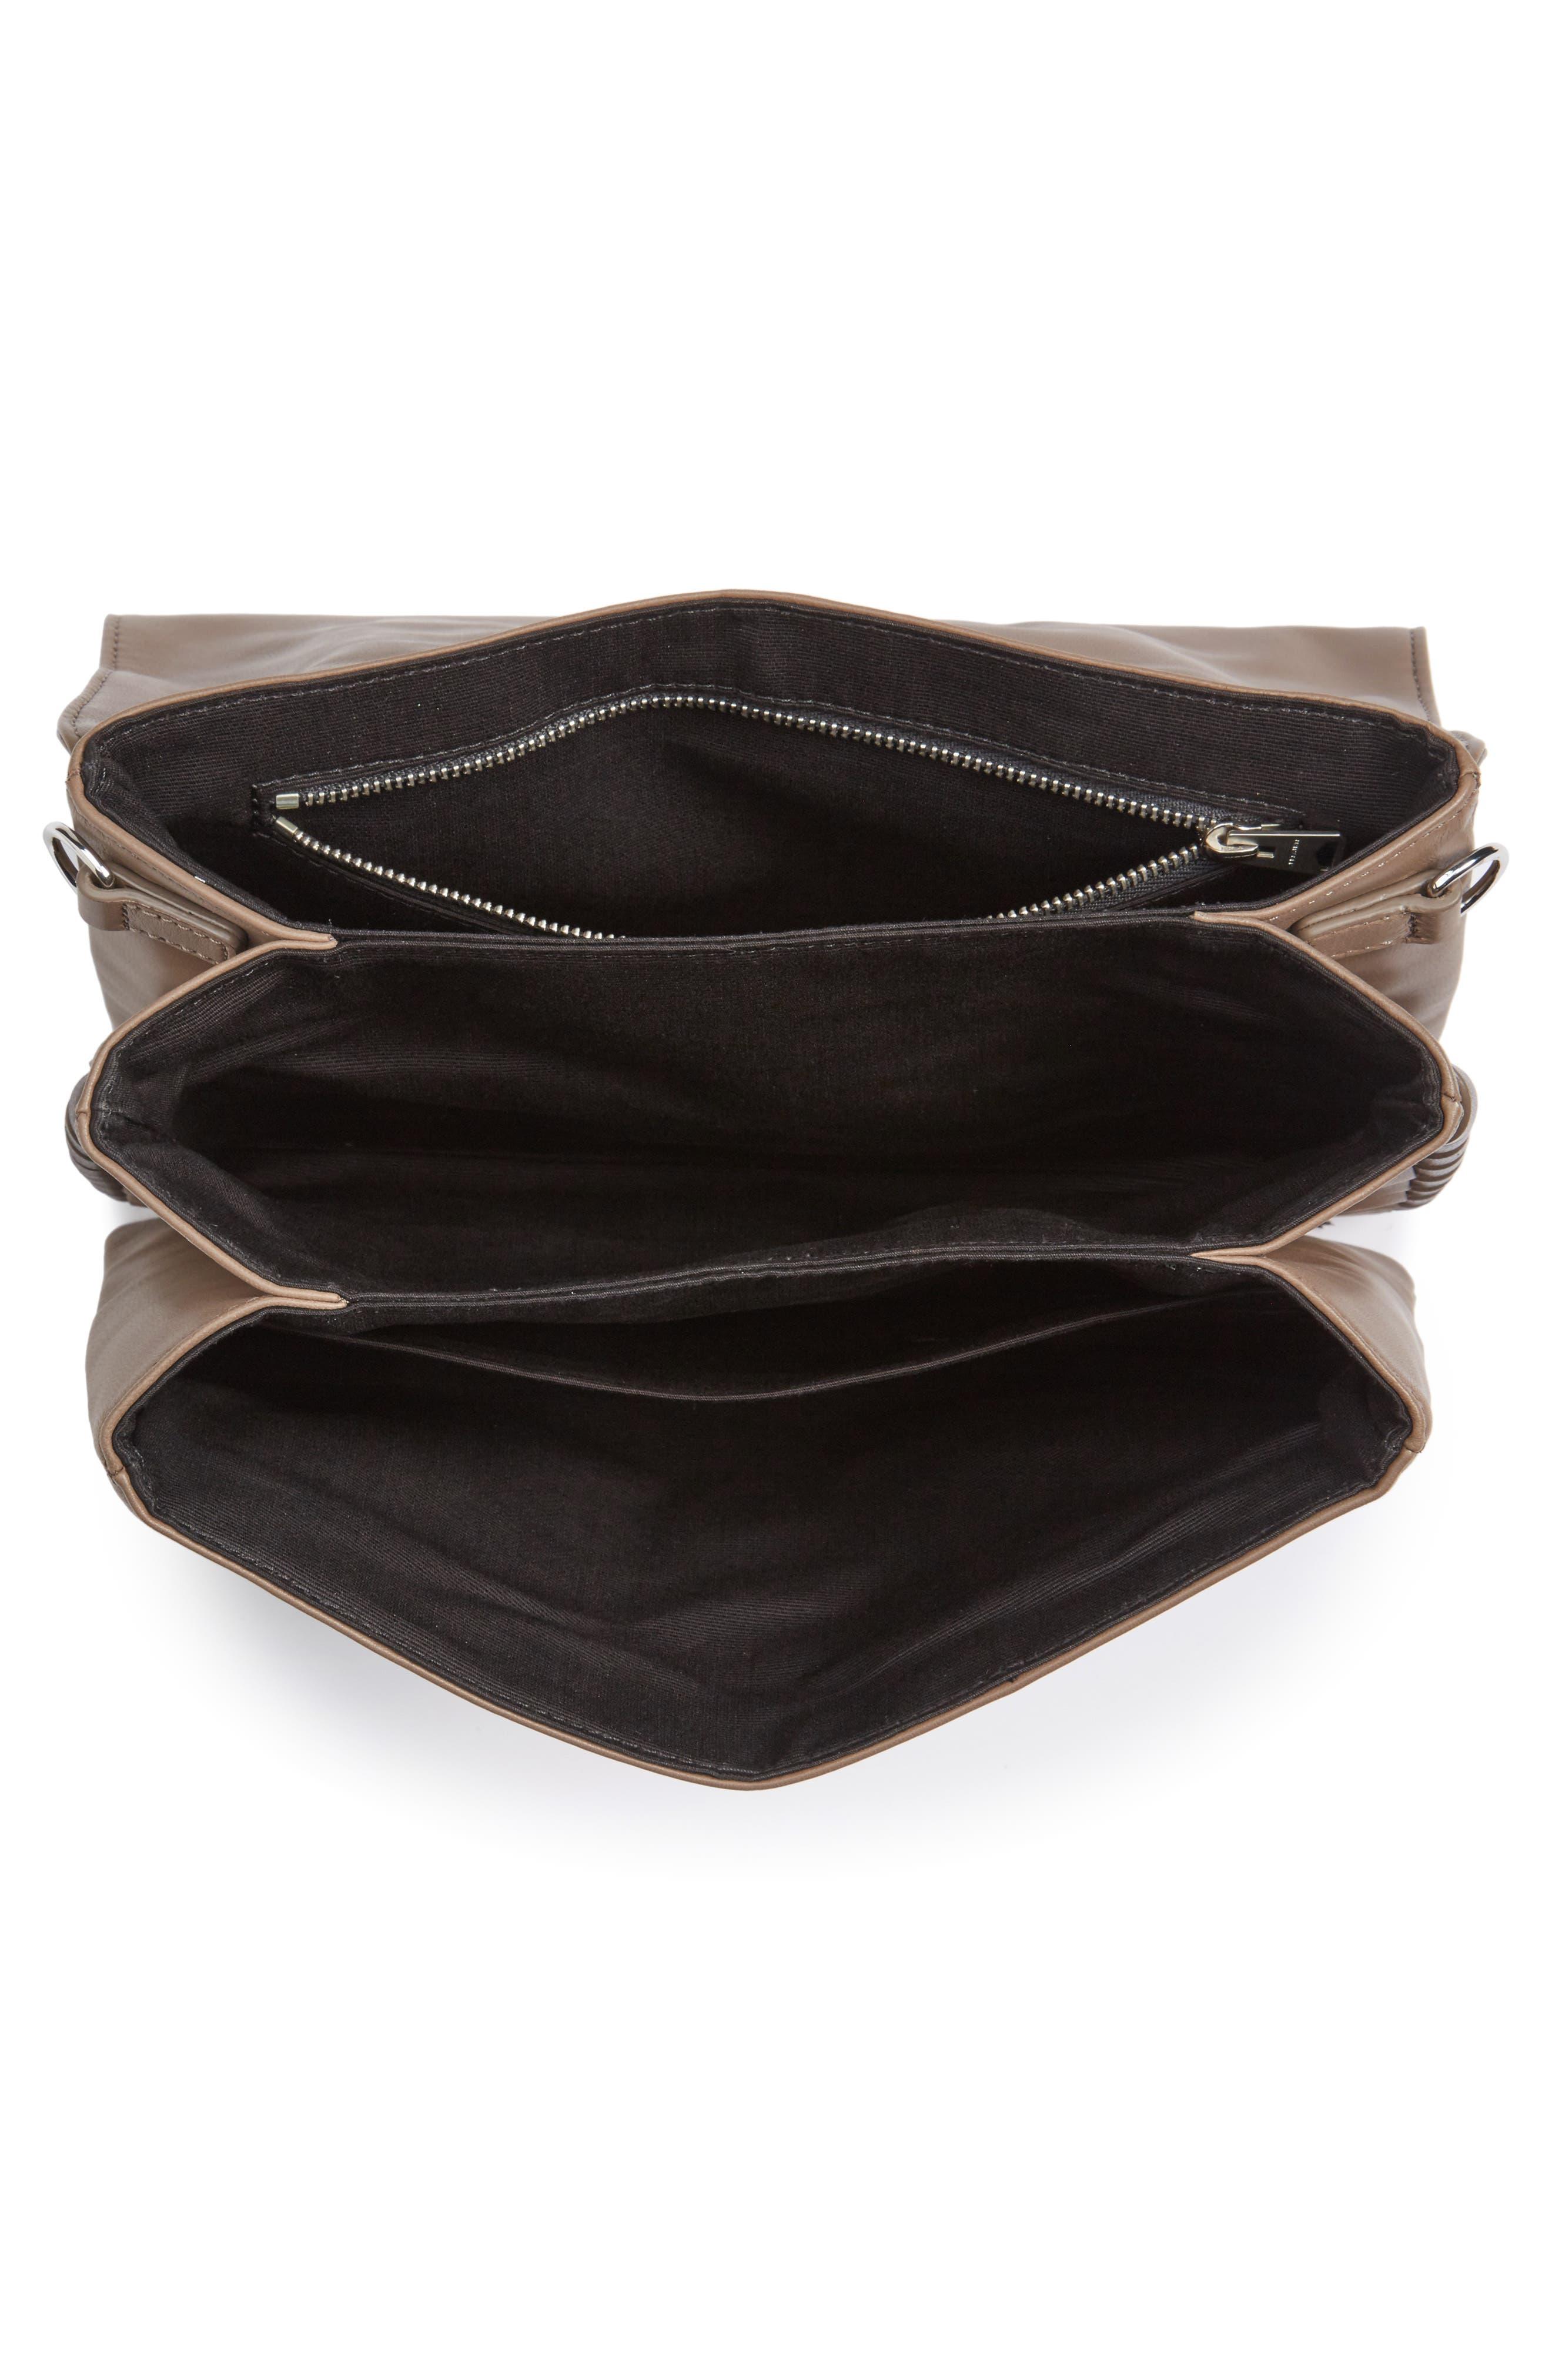 Fin Lambskin Leather Messenger Bag,                             Alternate thumbnail 7, color,